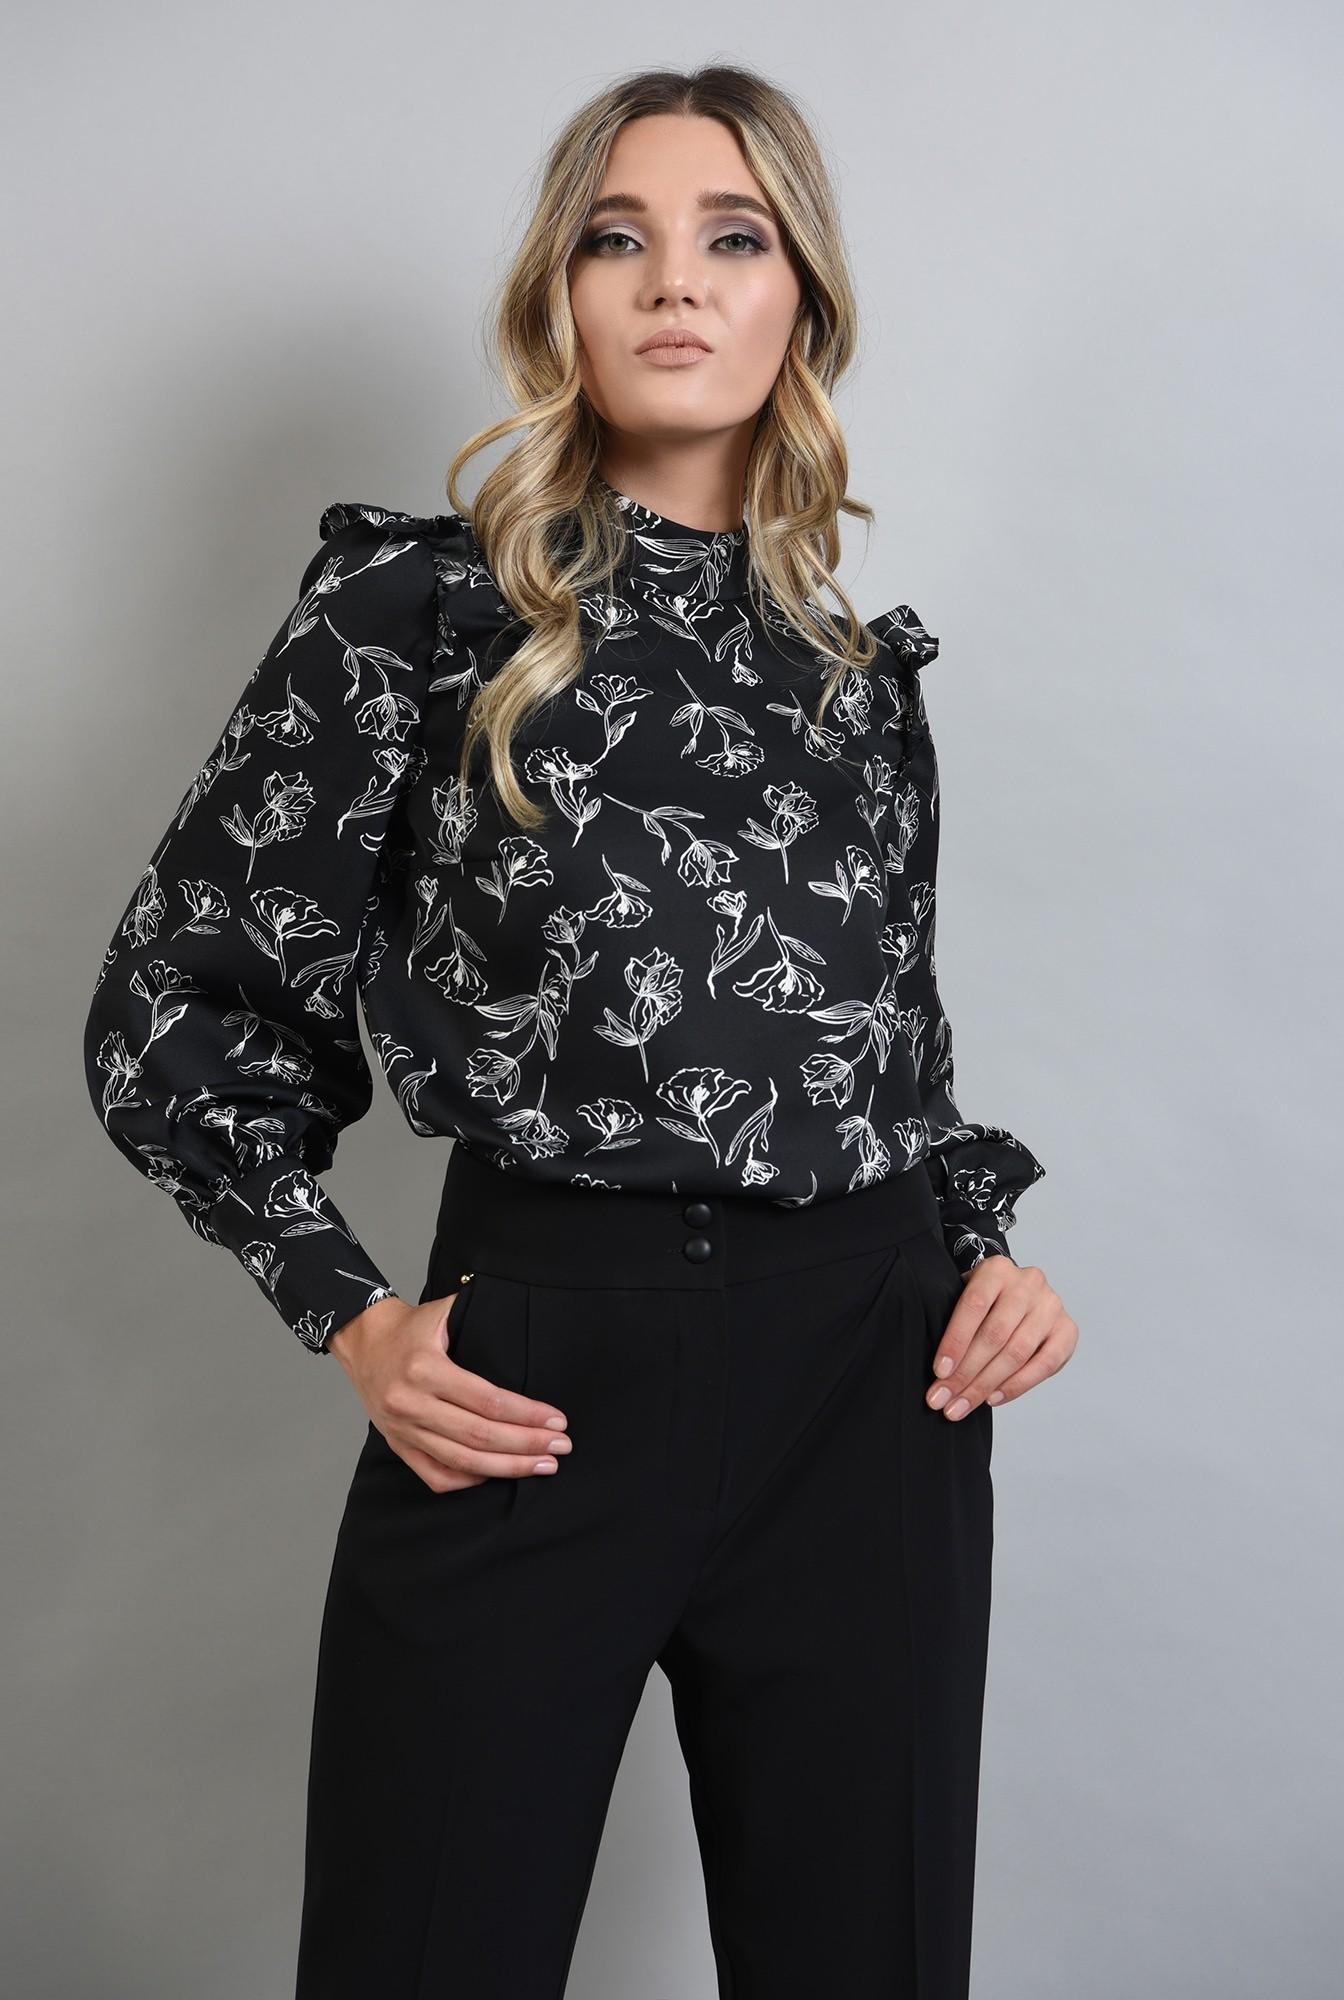 0 - bluza din satin cu volane si guler